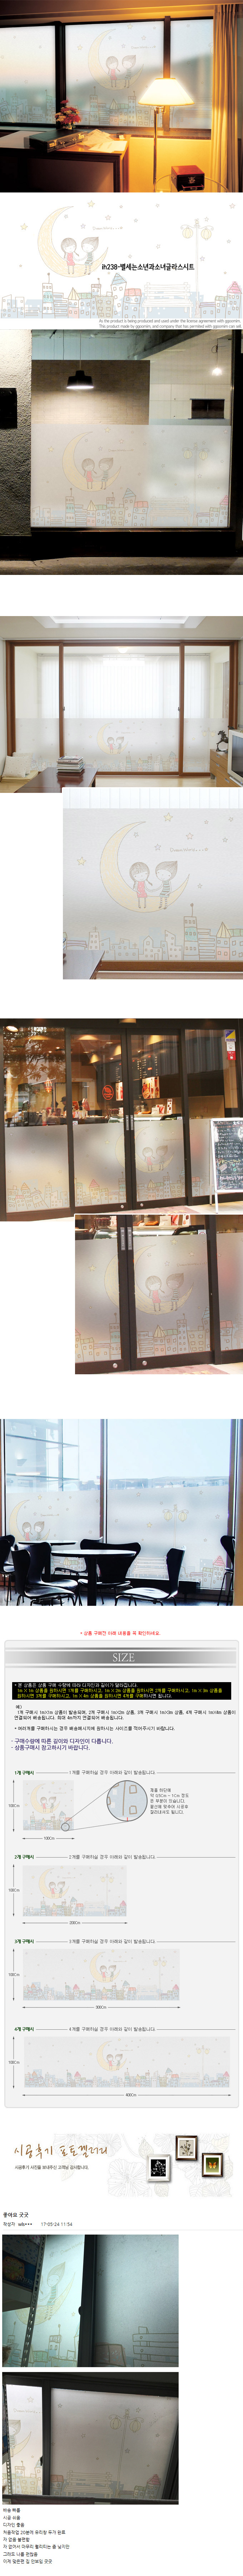 ih238-별세는소년과소녀글라스시트_글라스시트지 - 꾸밈, 16,000원, 벽지/시트지, 디자인 시트지